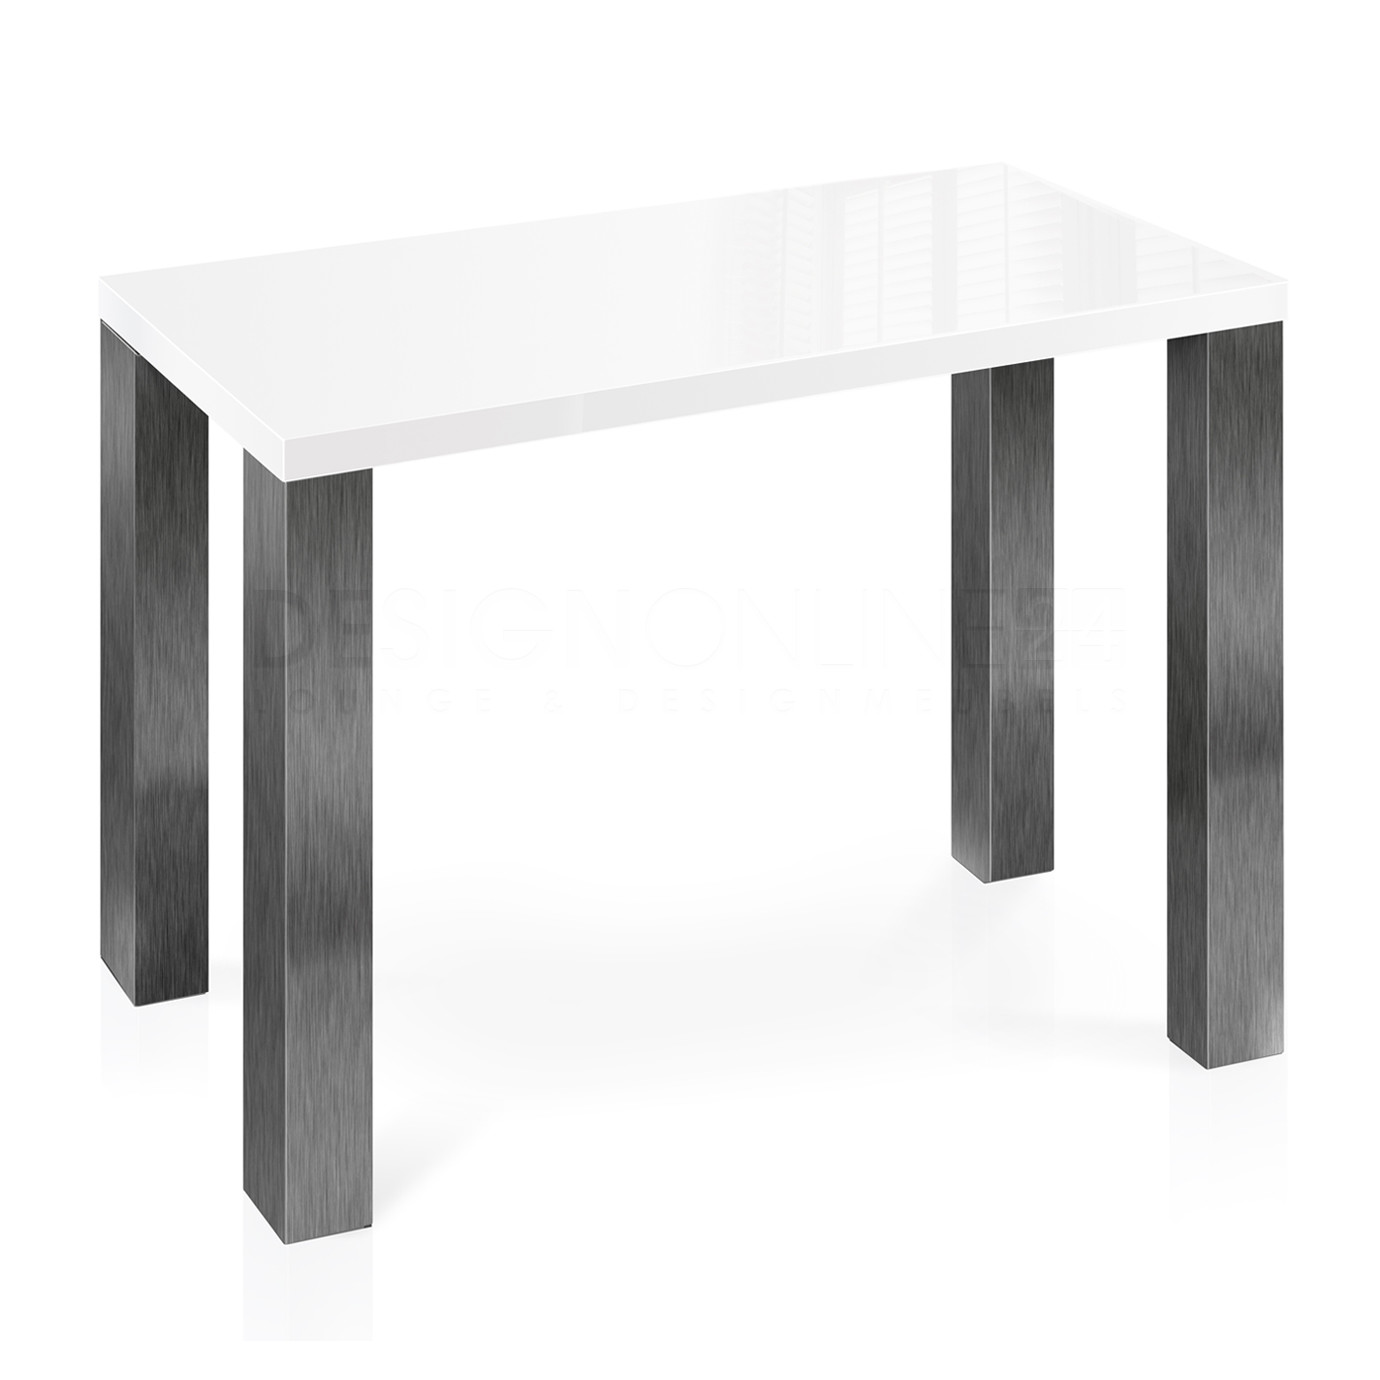 Bartafel Keuken Kopen : bartafel 135 x 70 x 92 cm high gloss wit rvs 24designs bartafel